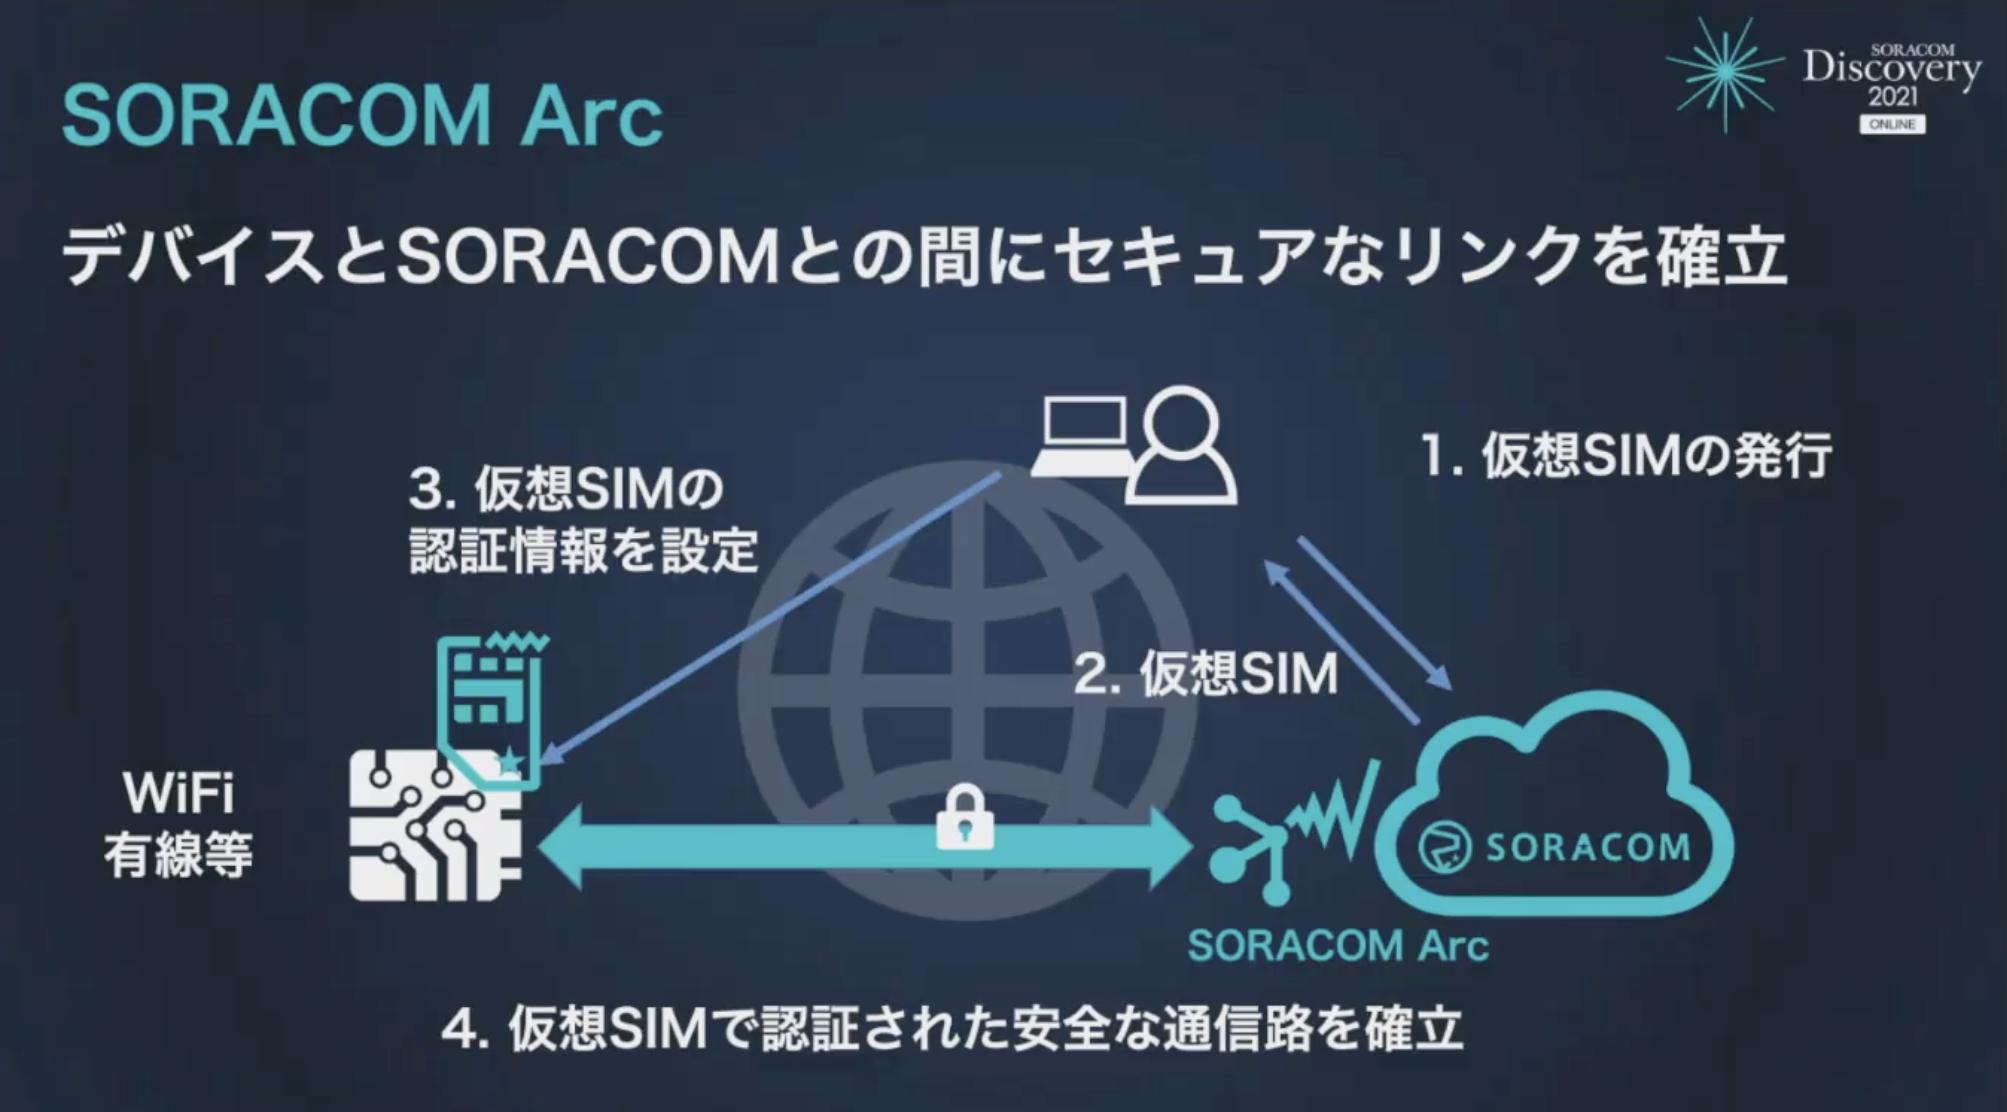 SORACOM Arcの仕組み